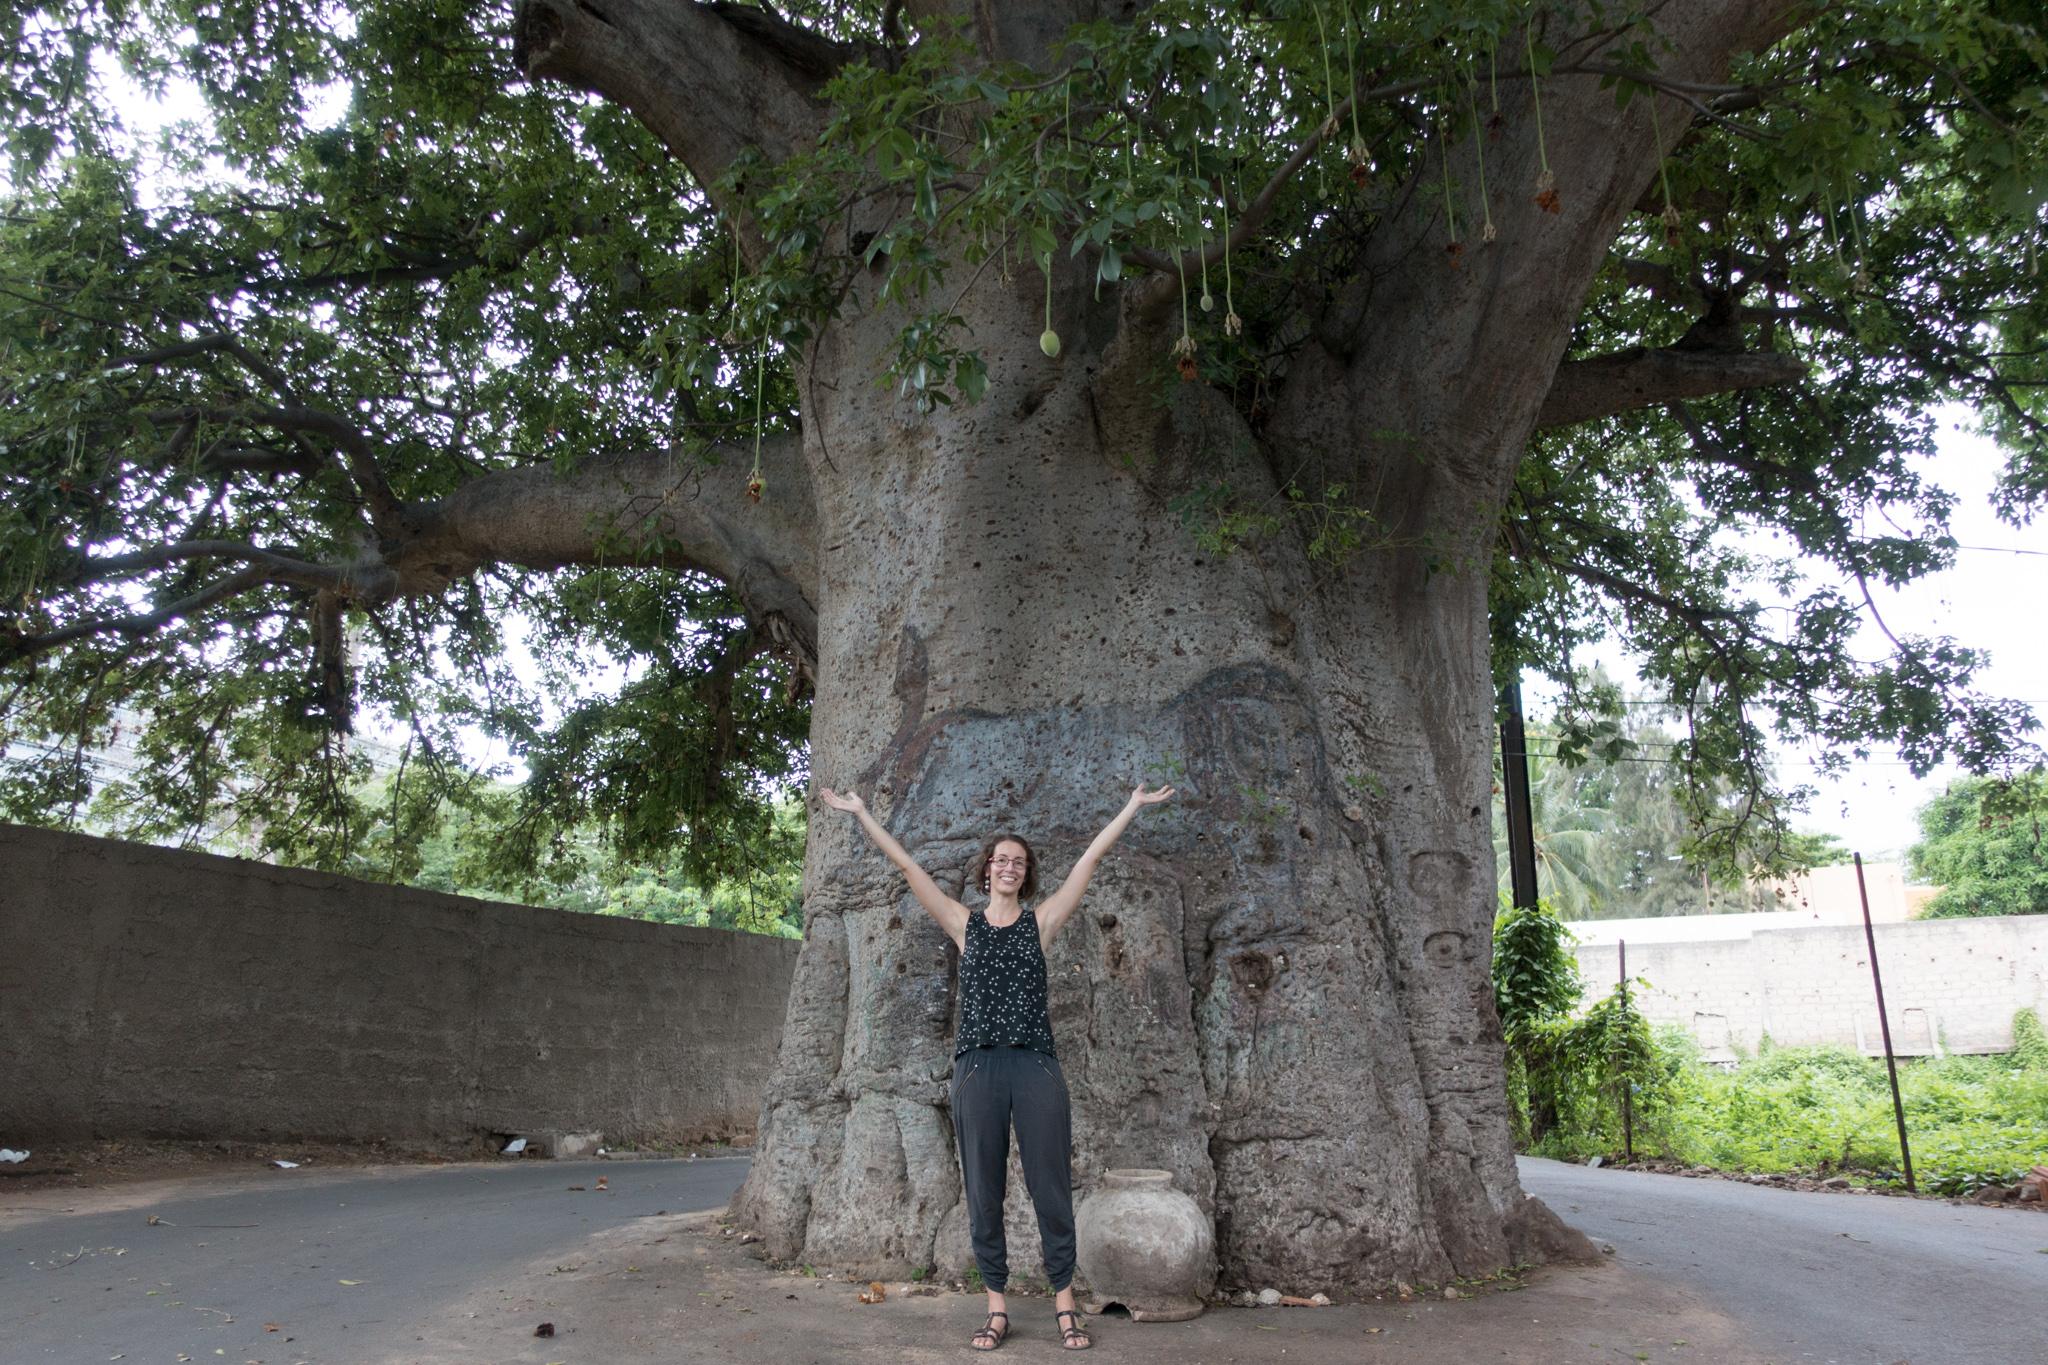 In front of a giant baobab in Dakar.